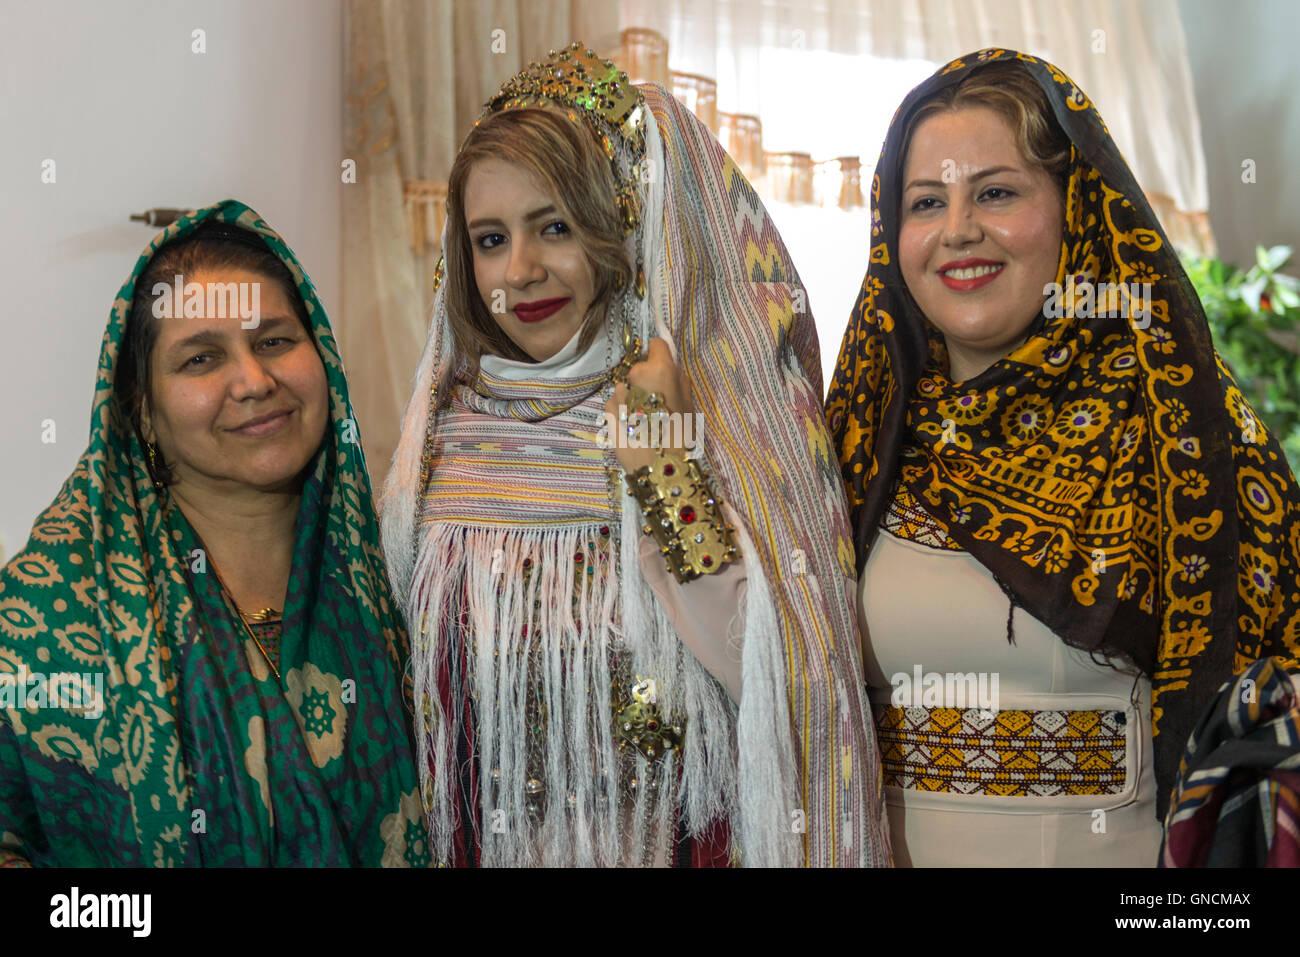 Bandar Torkaman, Turkmen Wedding, Bride With Traditional Veil & Relatives - Stock Image